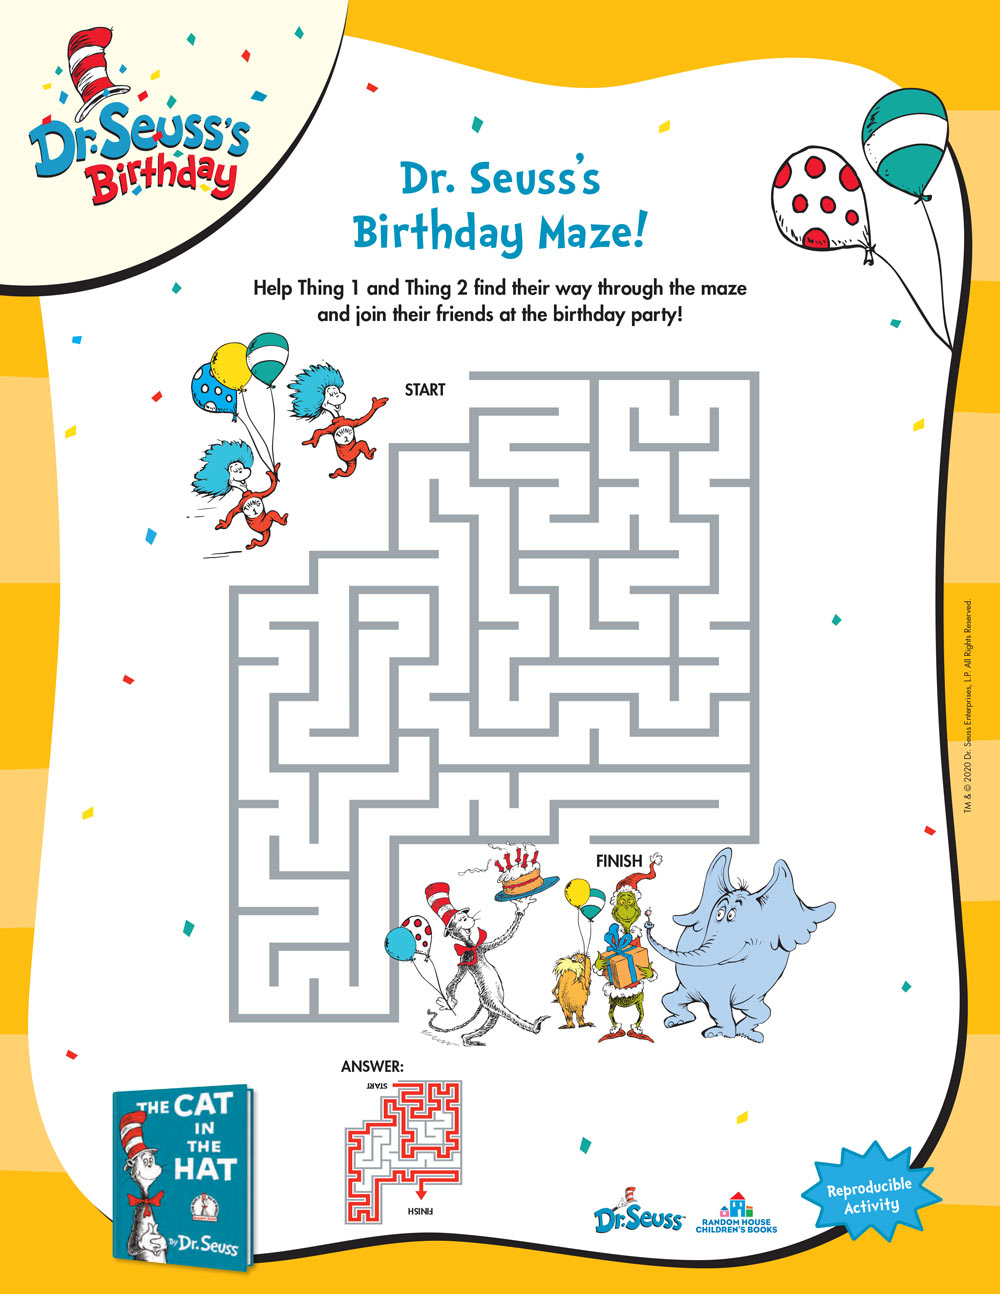 Dr. Seuss's Birthday Maze